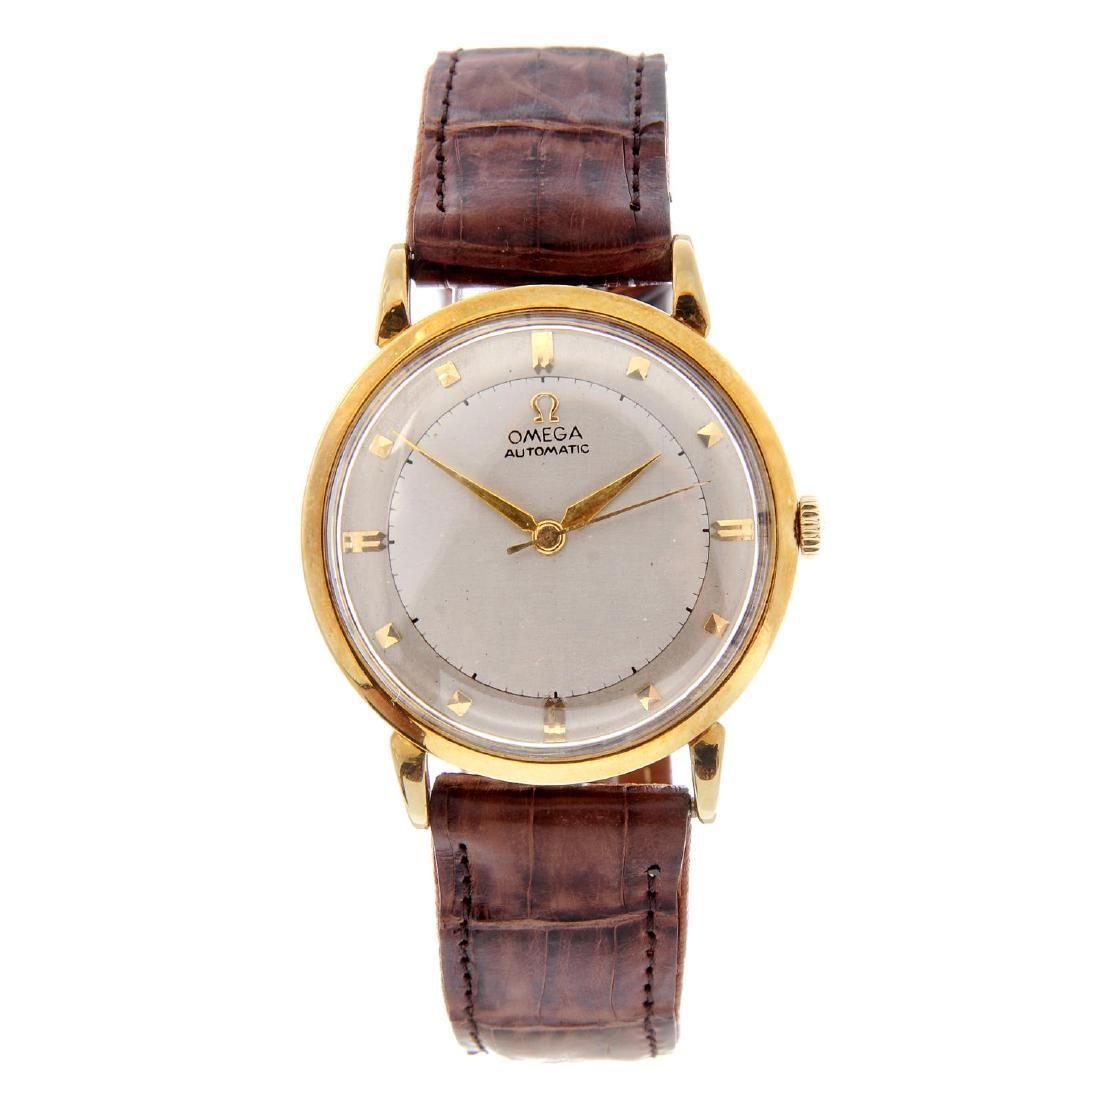 OMEGA - a gentleman's wrist watch. Yellow metal case,